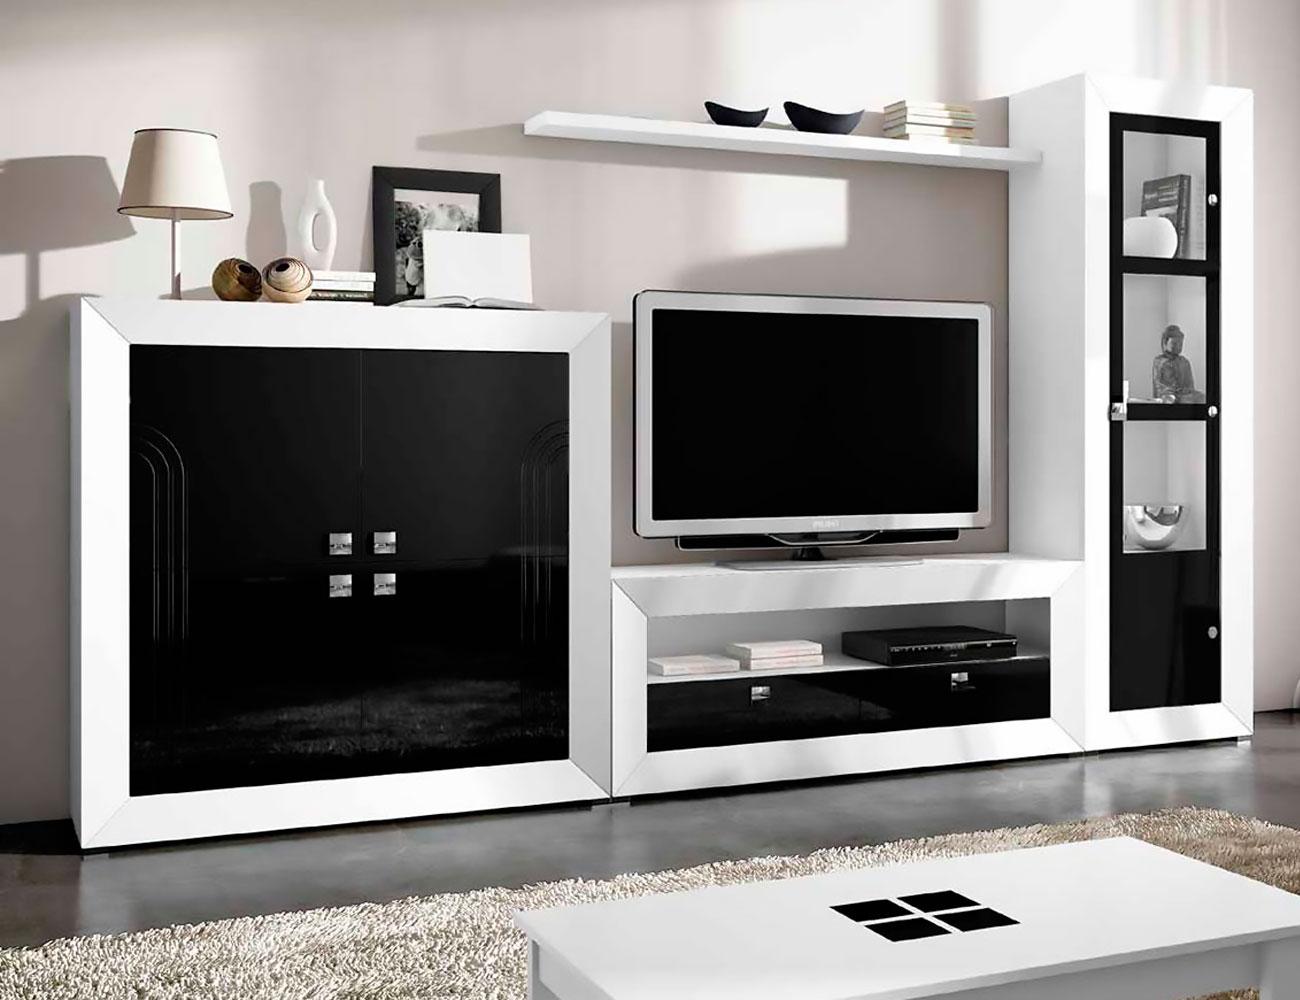 Mueble salon moderno 061